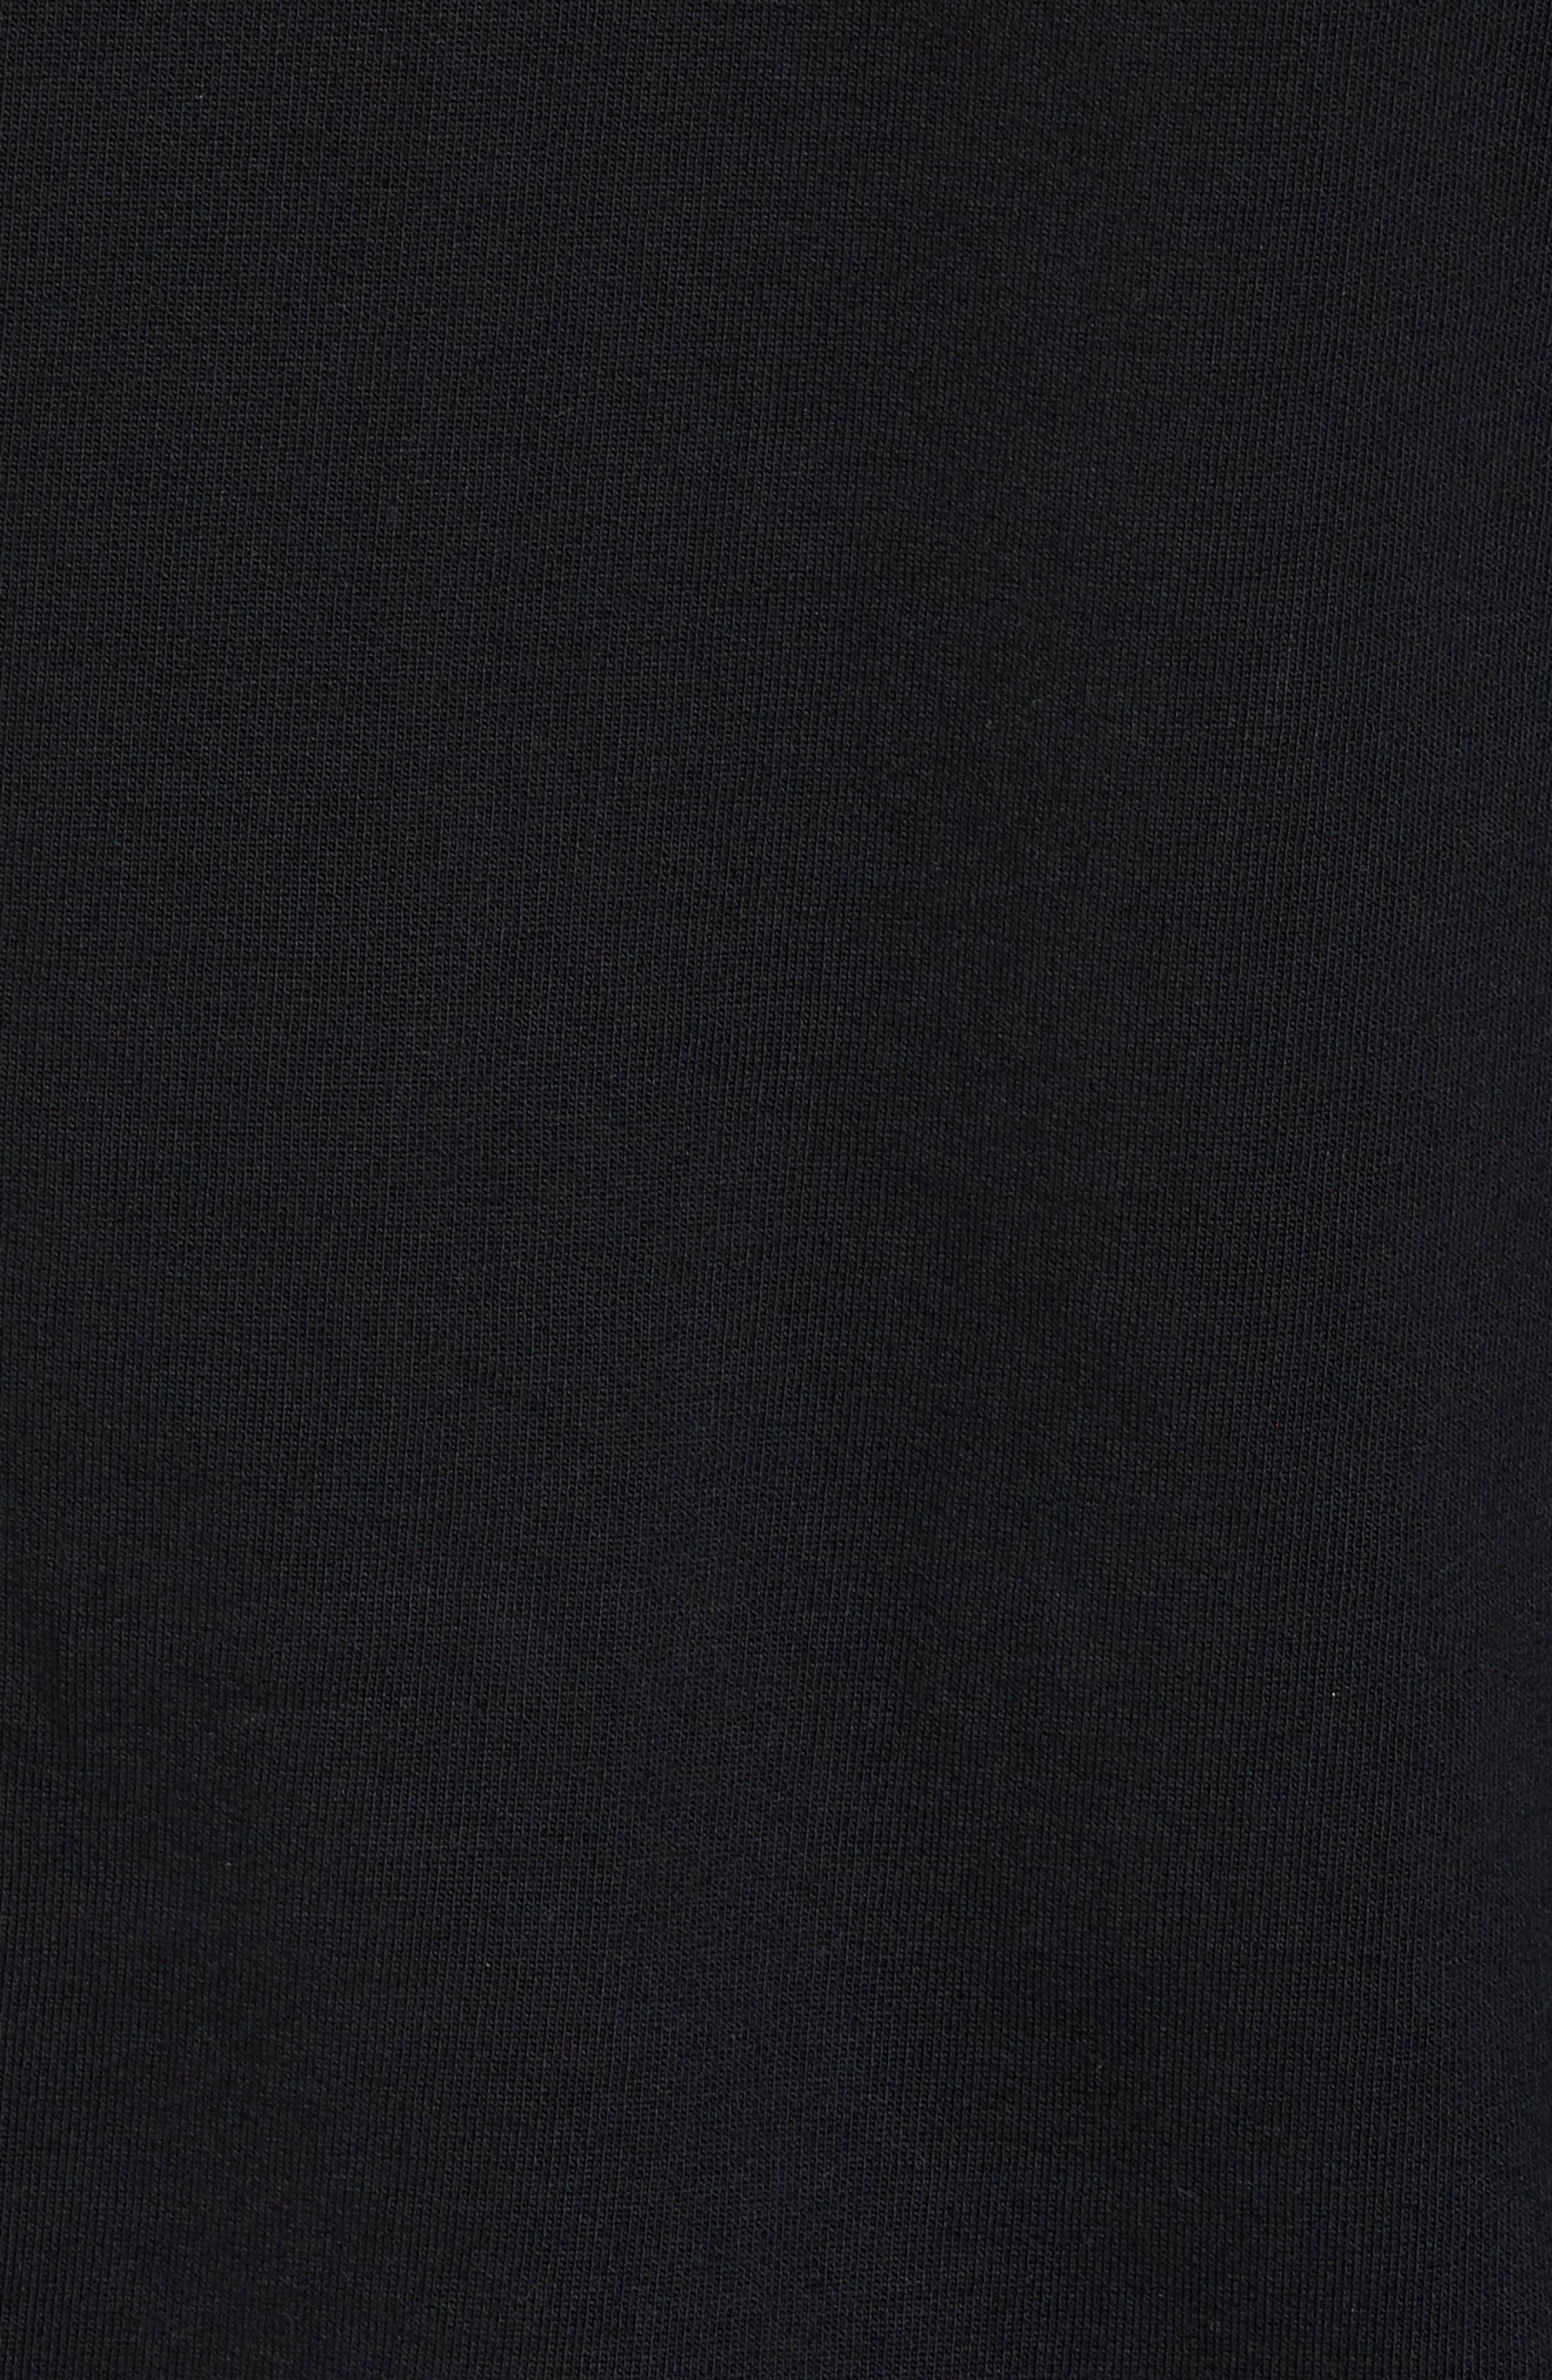 Lyle Slim Fit Quarter Zip Hoodie,                             Alternate thumbnail 5, color,                             True Black